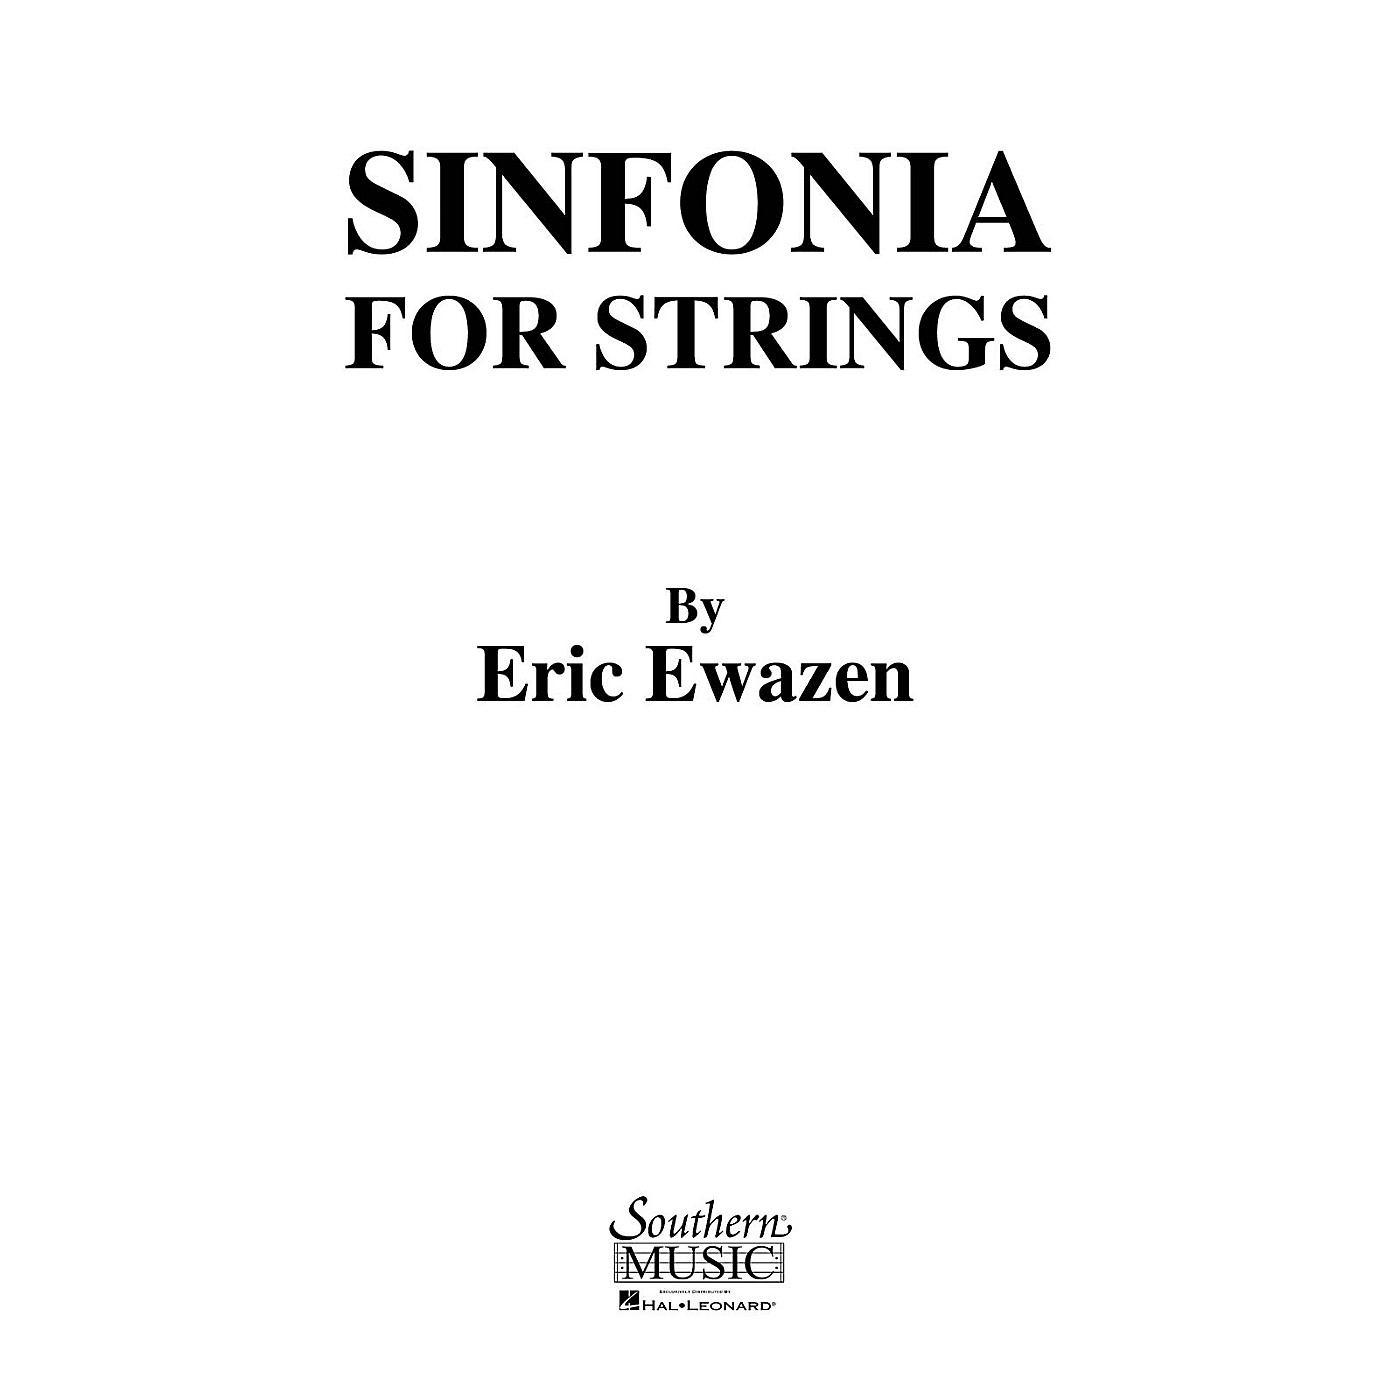 Southern Sinfonia for Strings (String Orchestra Music/String Orchestra) Southern Music Series by Eric Ewazen thumbnail